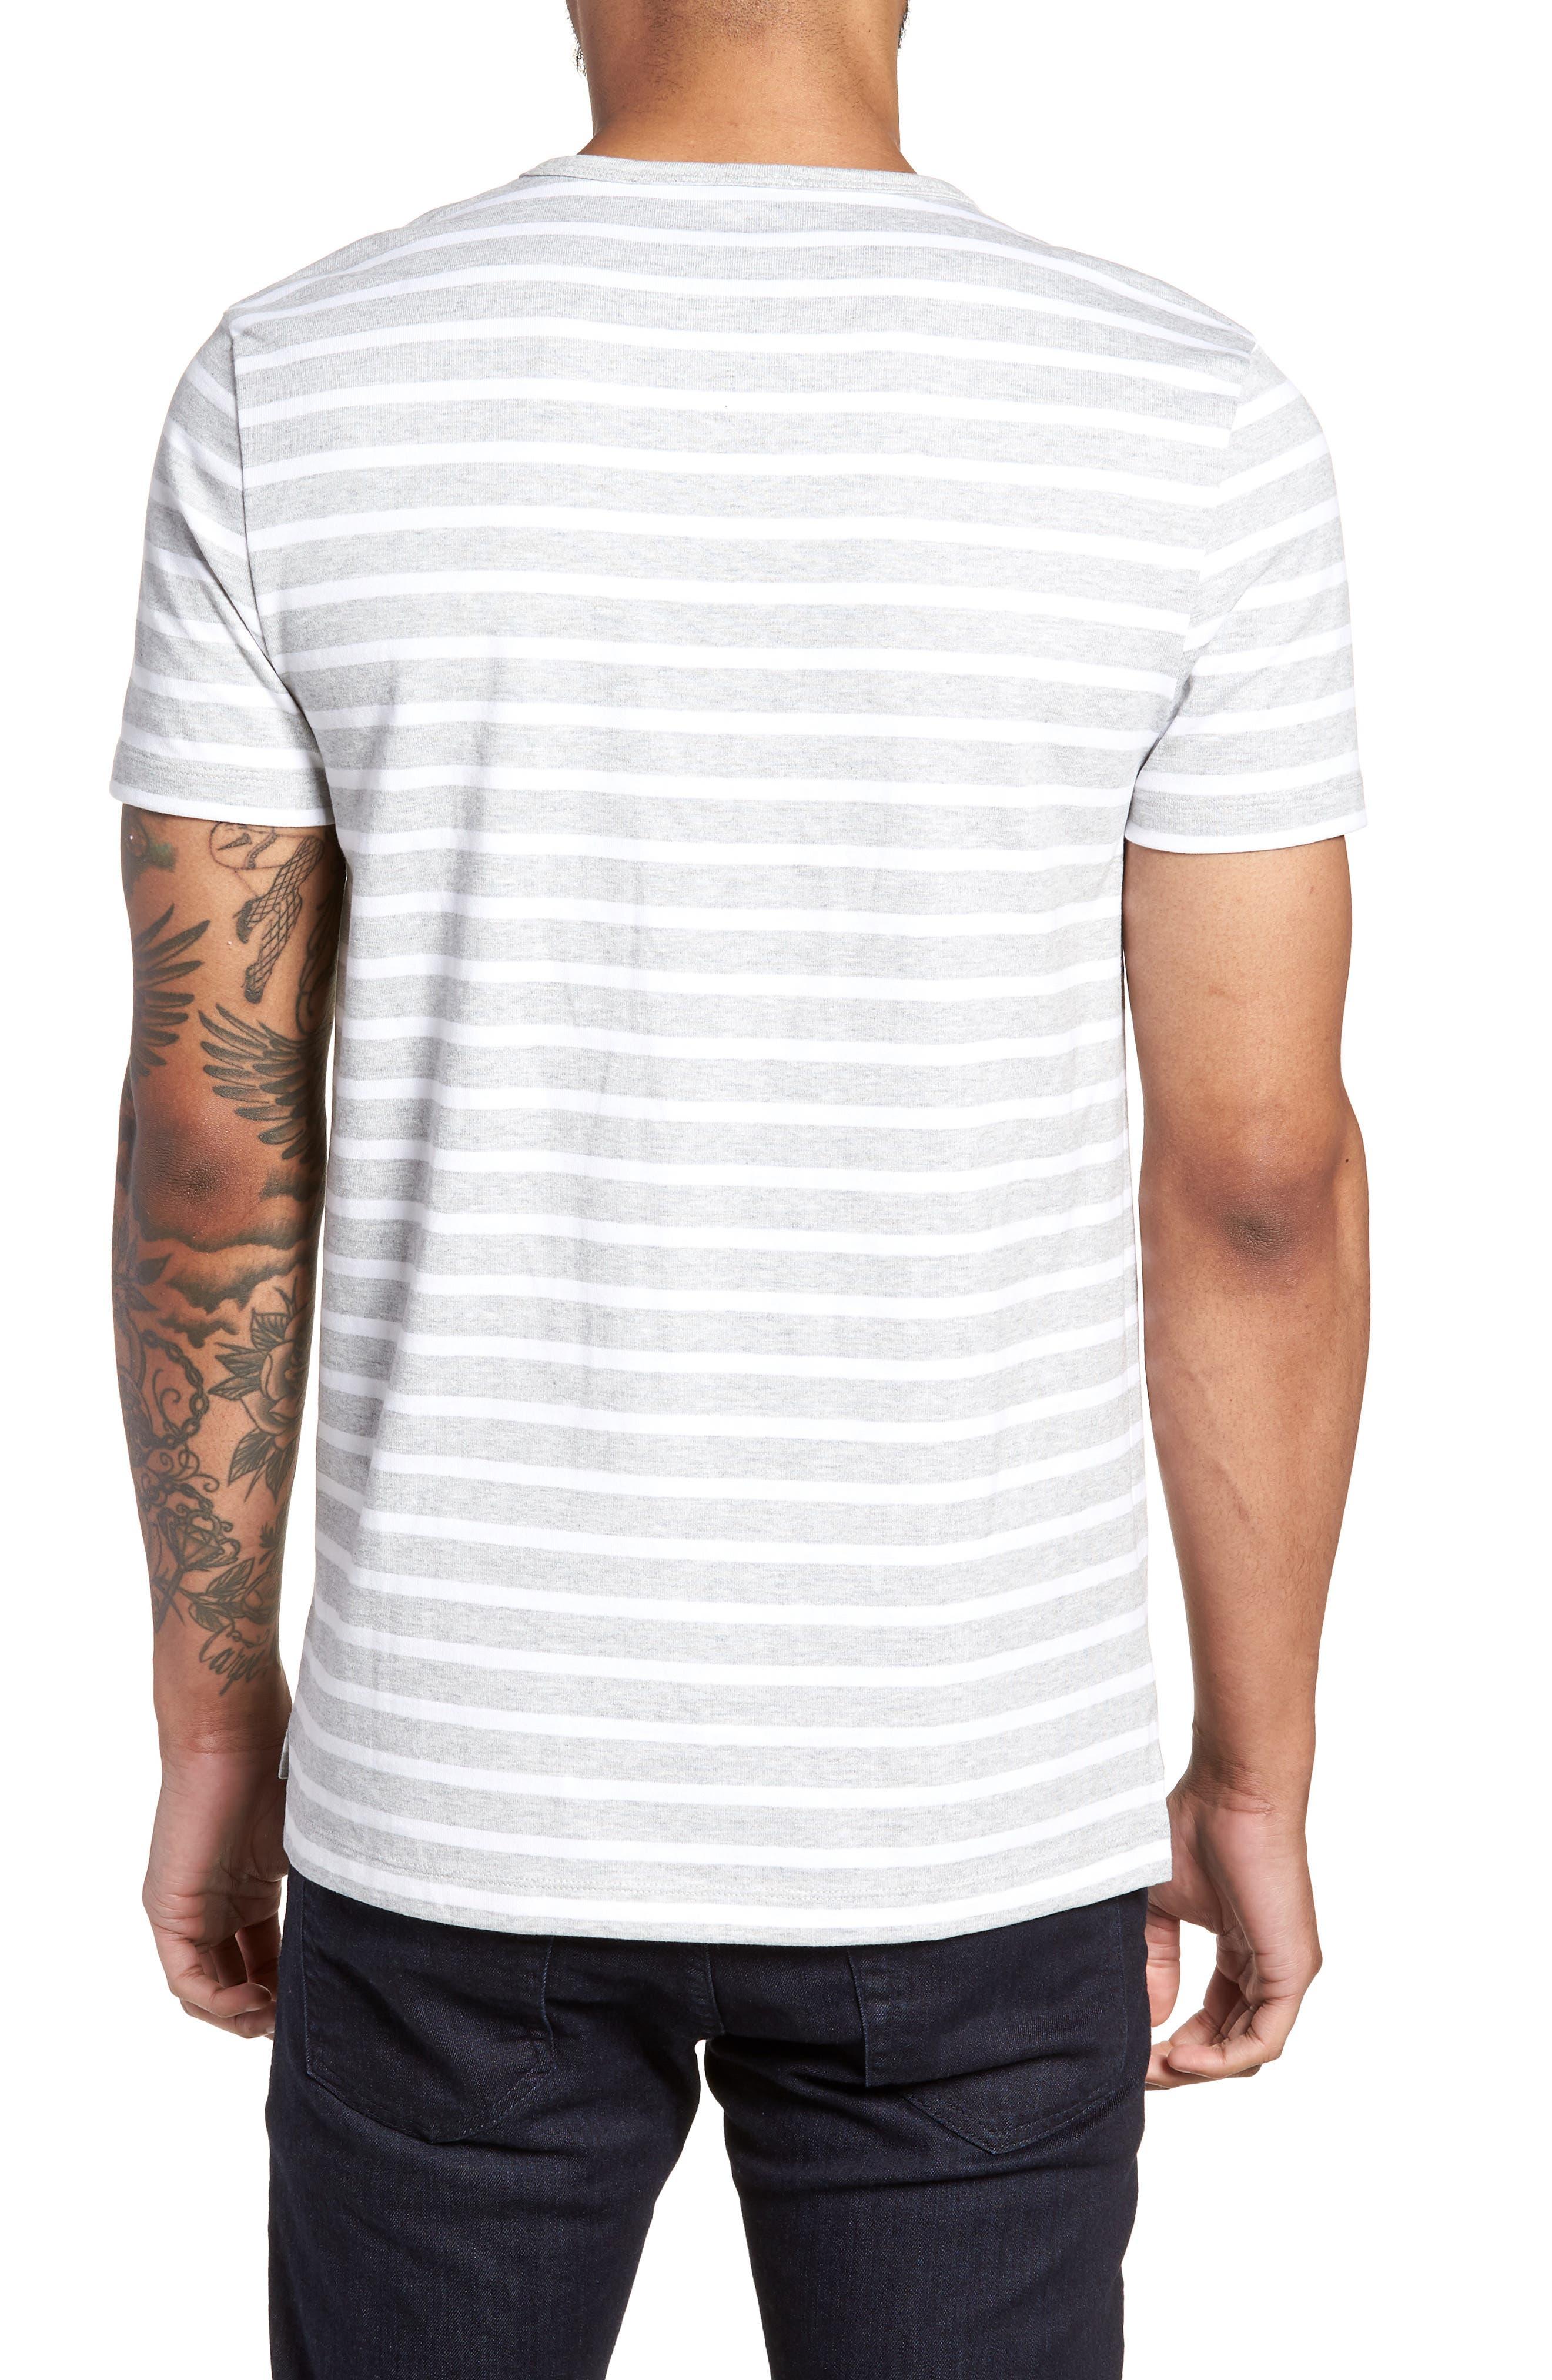 Tessler Slim Fit Crewneck T-Shirt,                             Alternate thumbnail 2, color,                             072